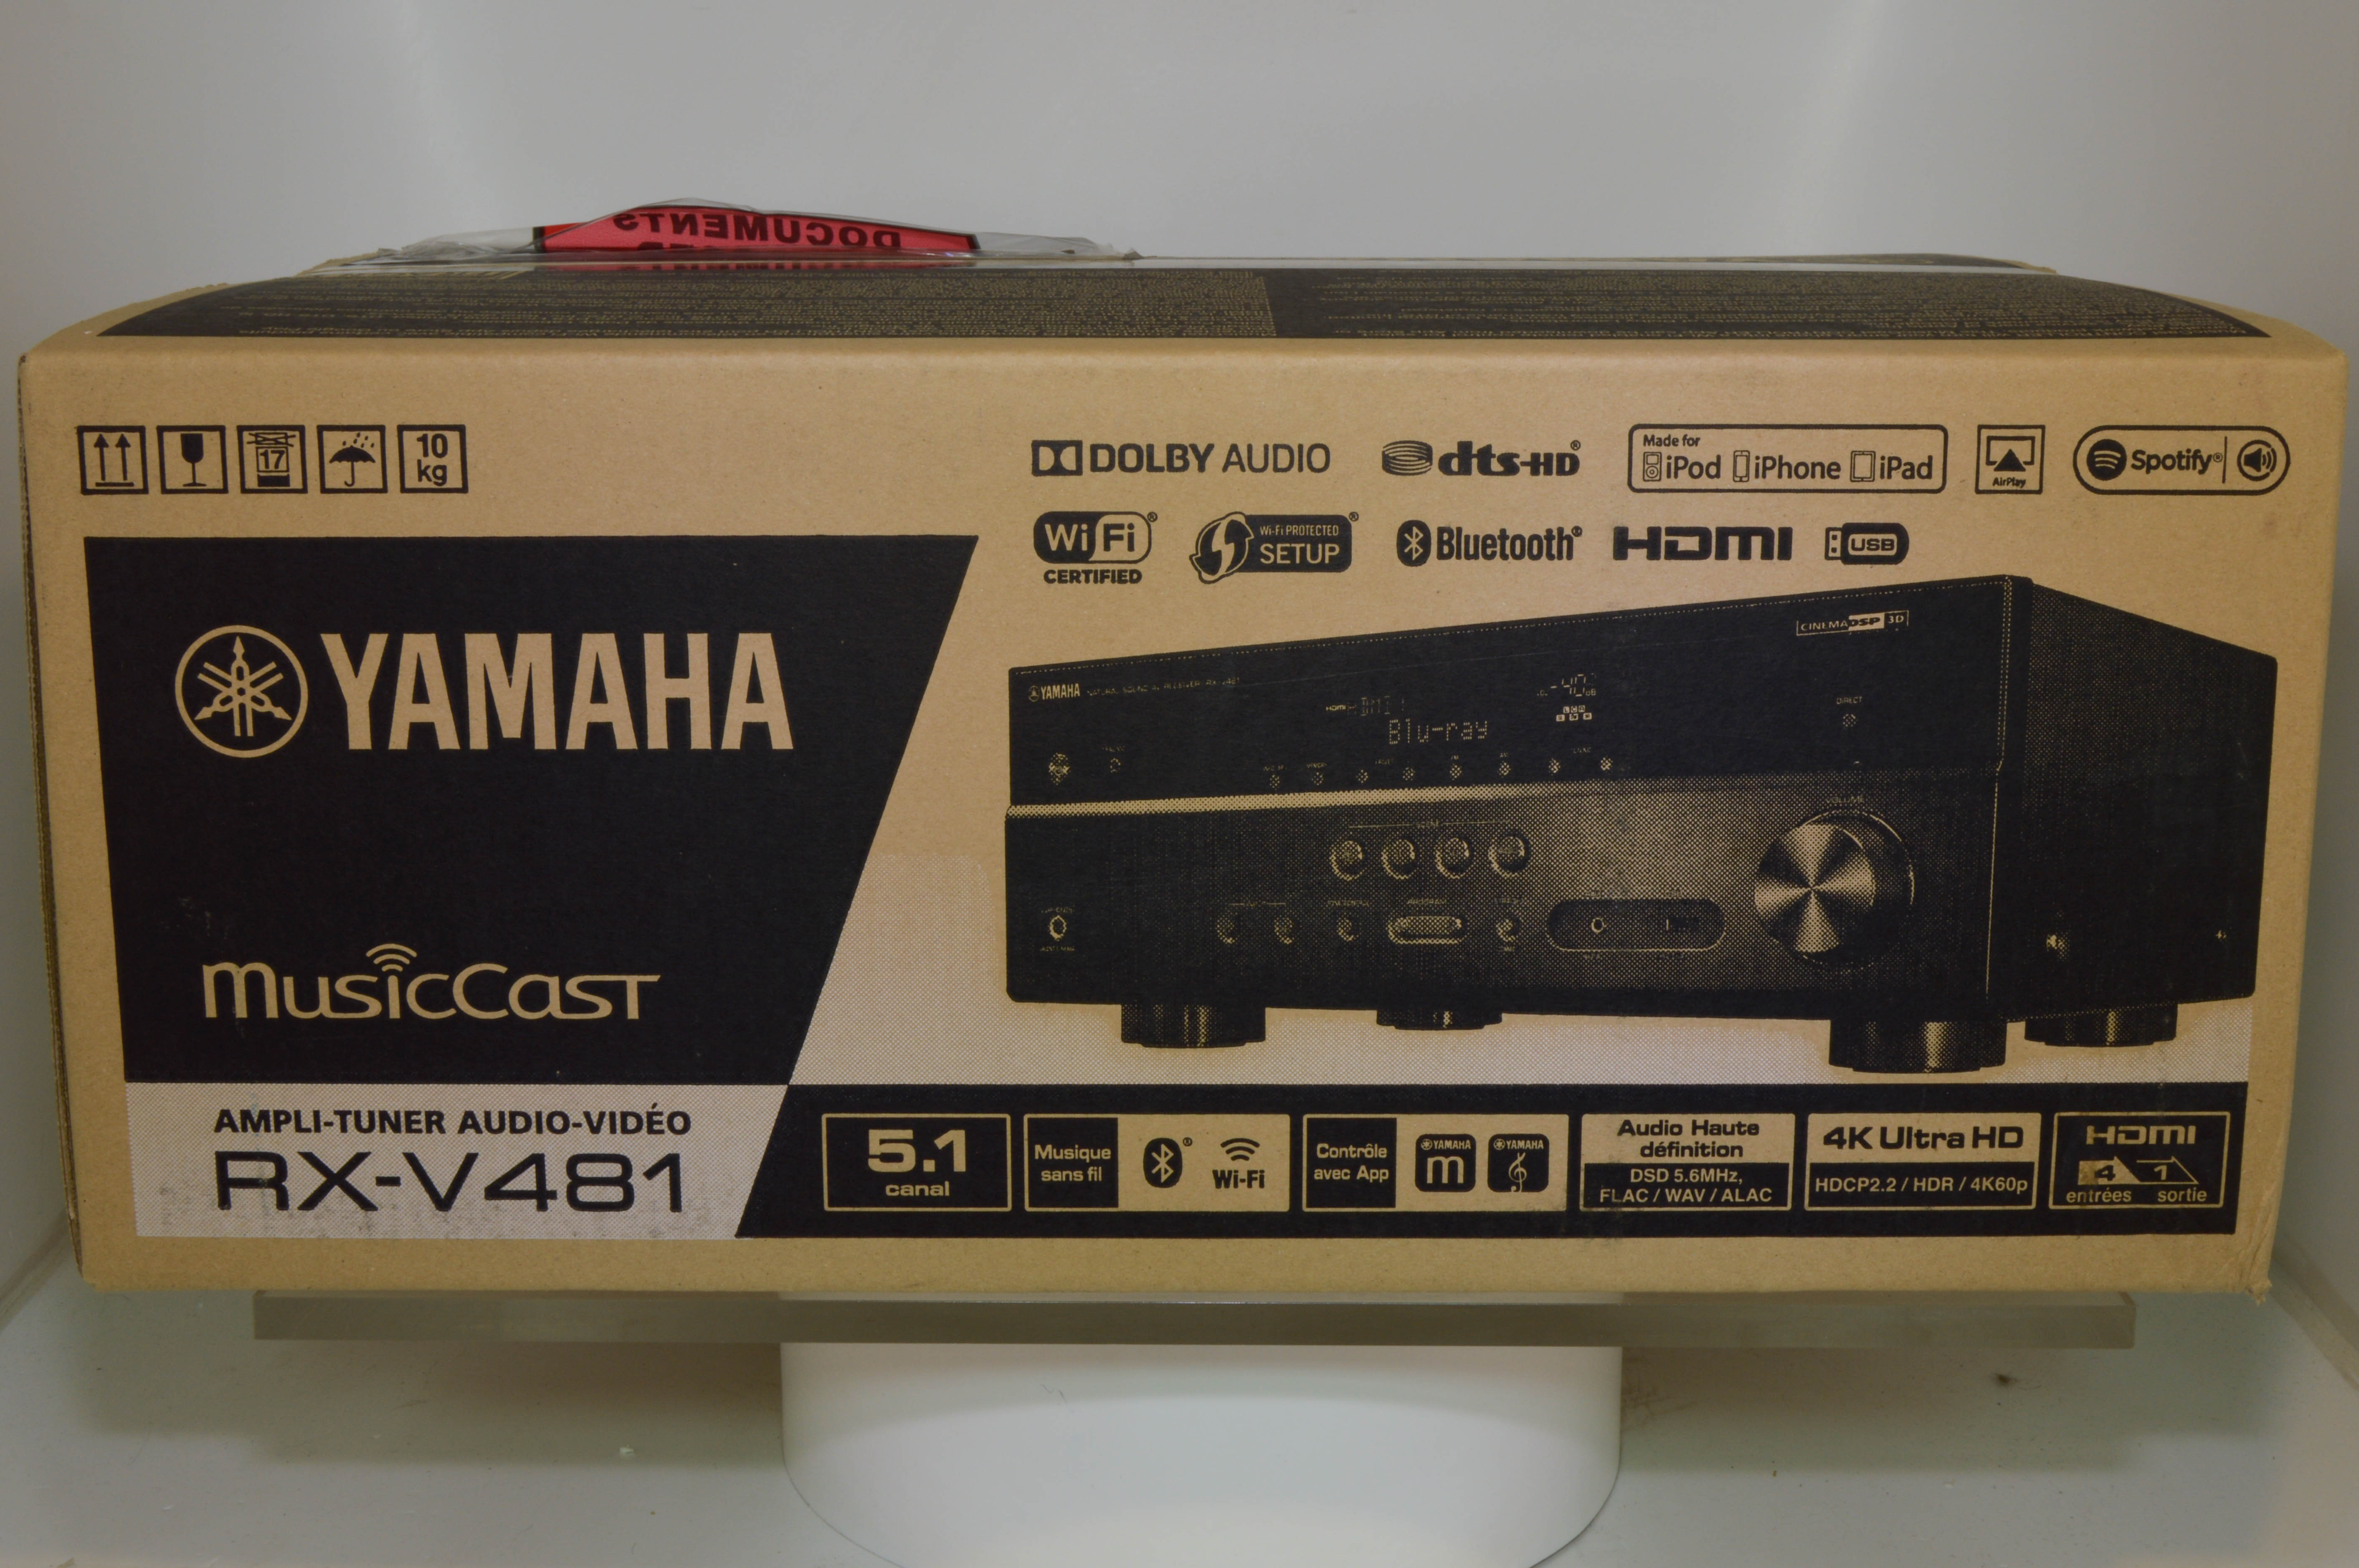 Yamaha rx v481 av receiver 2ndhandhifi used hifi for Yamaha receiver customer support phone number